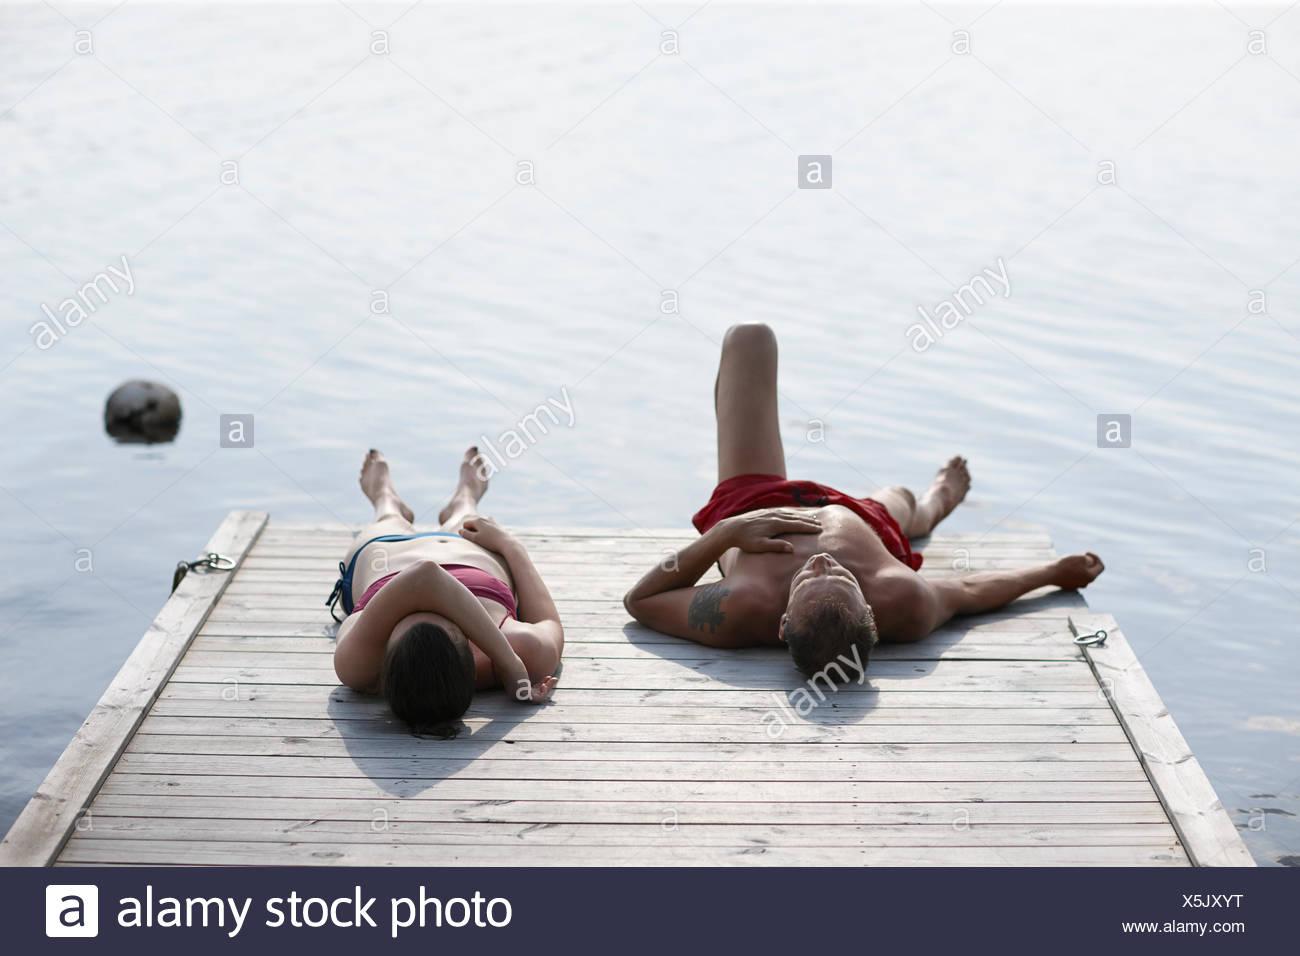 Sweden, Dalarna, Siljan, Man and woman lying on jetty Stock Photo